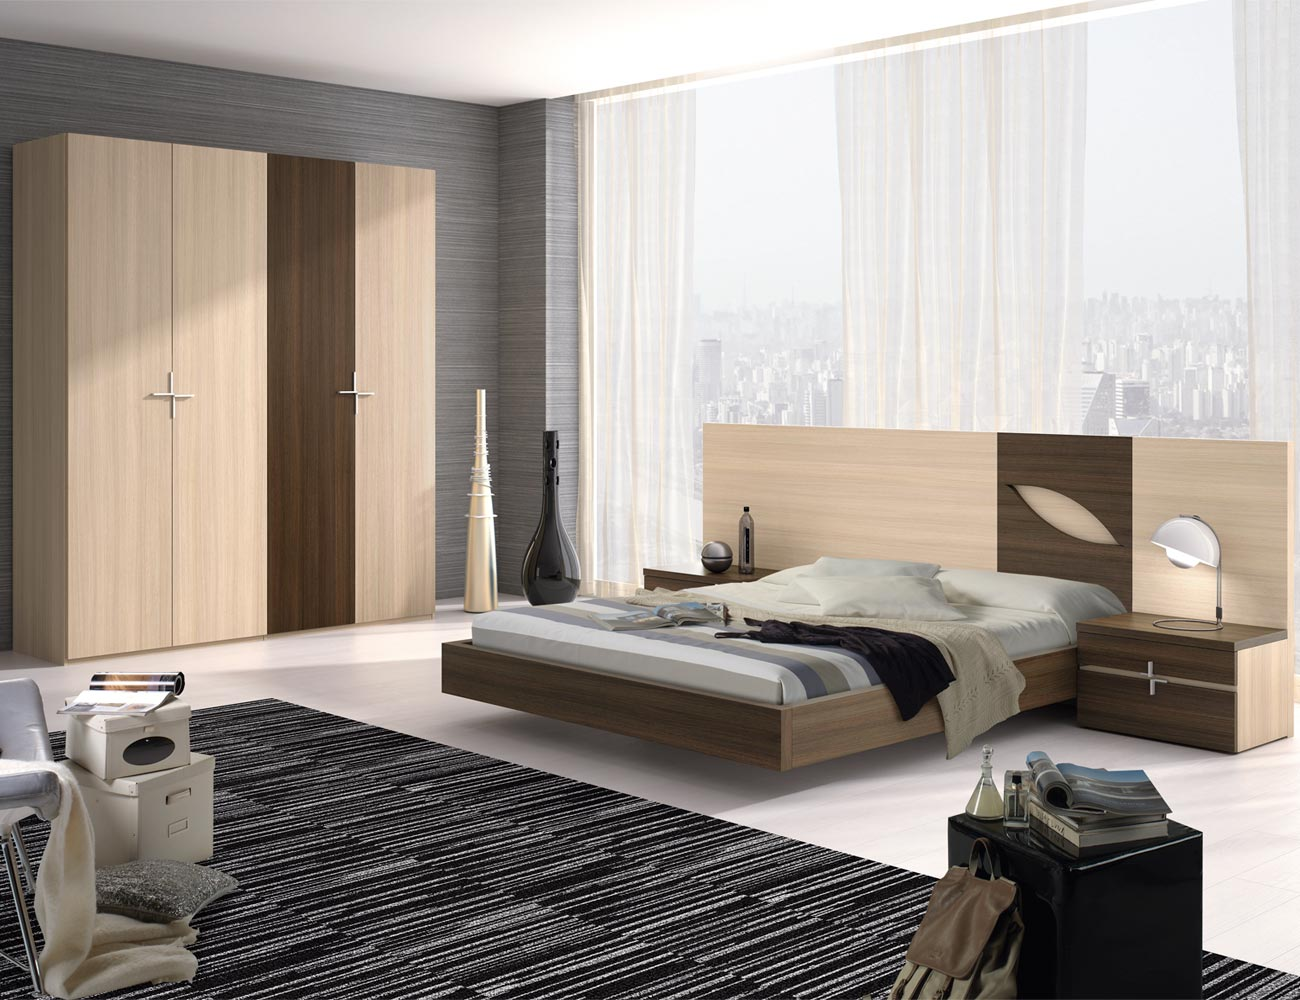 111 dormitorio matrimonio roble armario